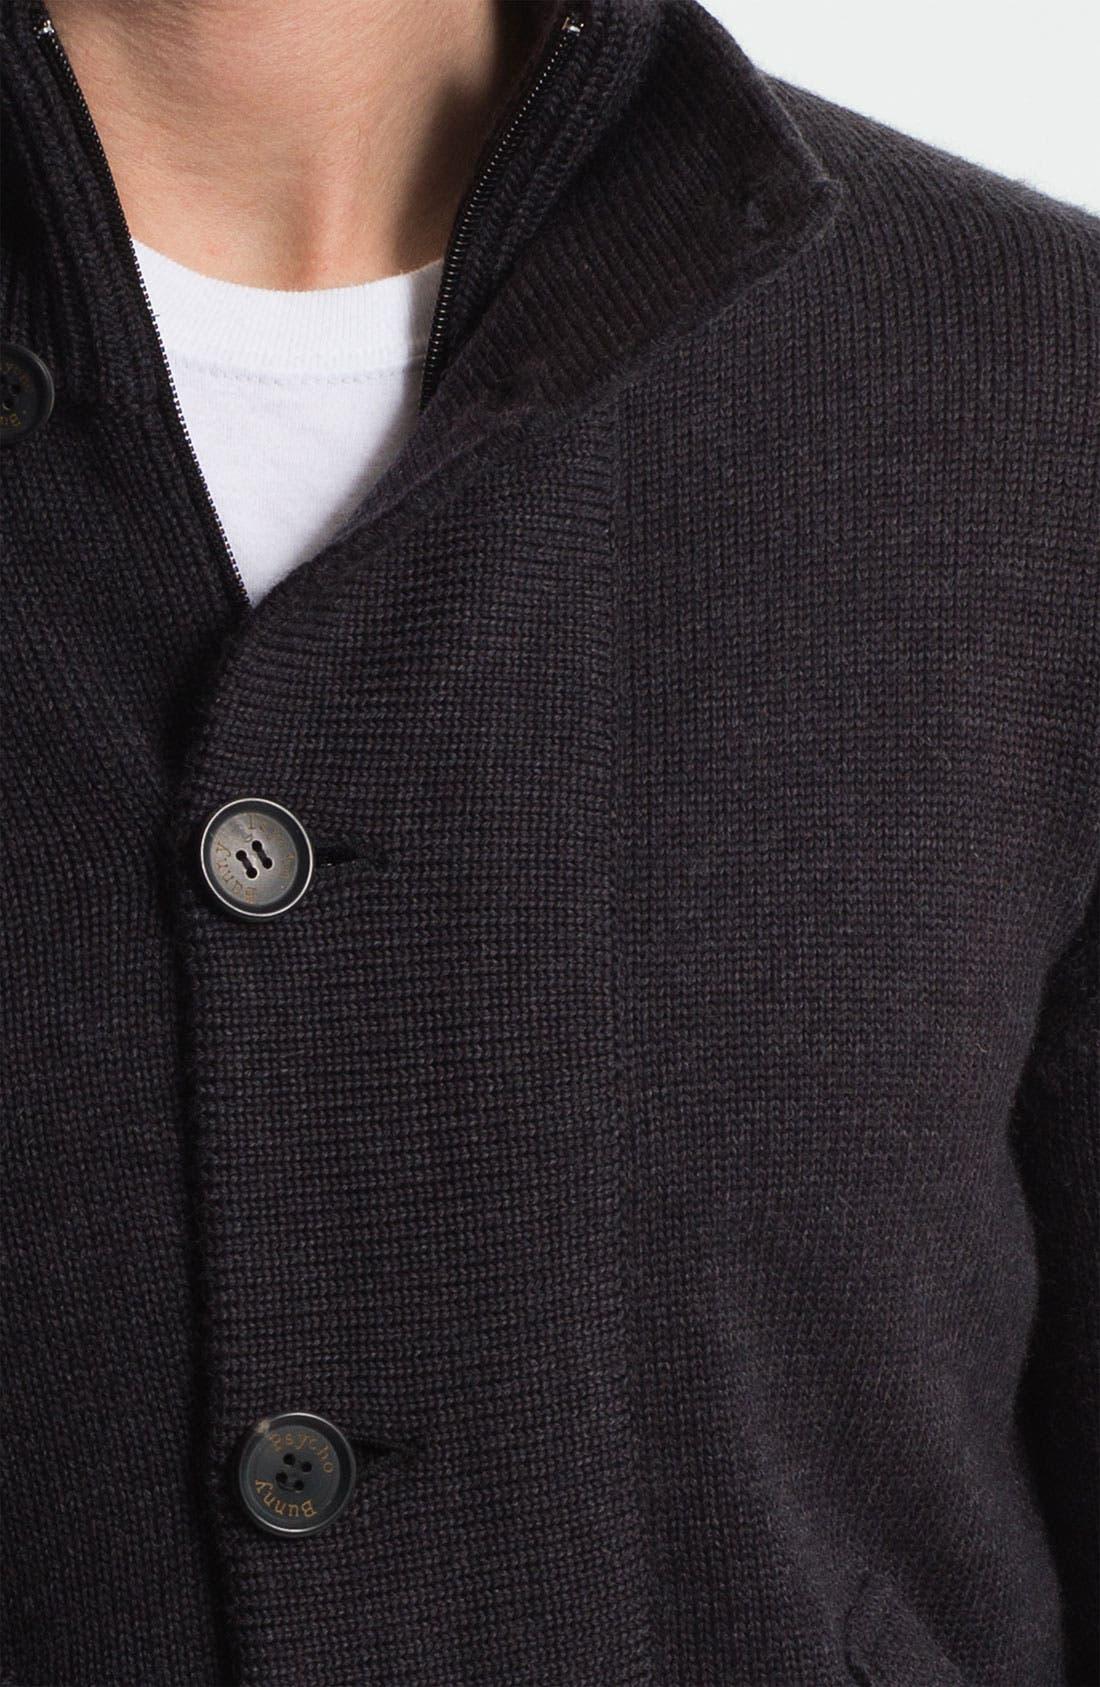 Mock Neck Merino Wool Sweater,                             Alternate thumbnail 3, color,                             010